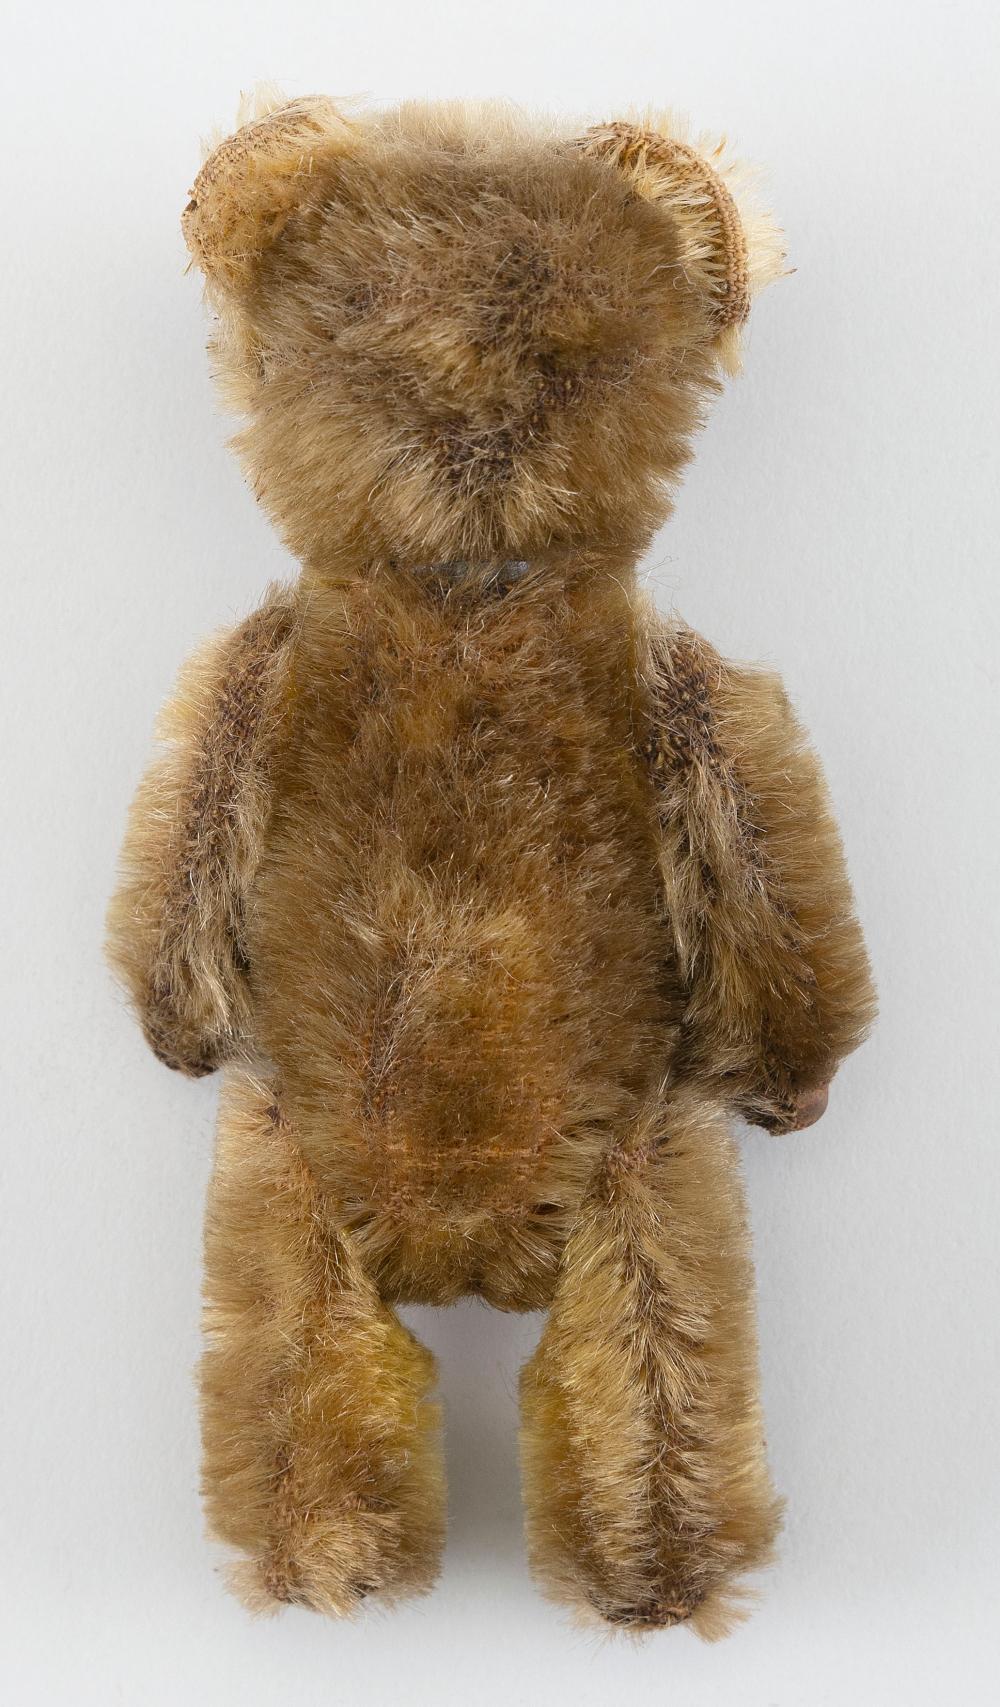 "SCHUCO TEDDY BEAR PERFUME BOTTLE 1920 German Height 5""."